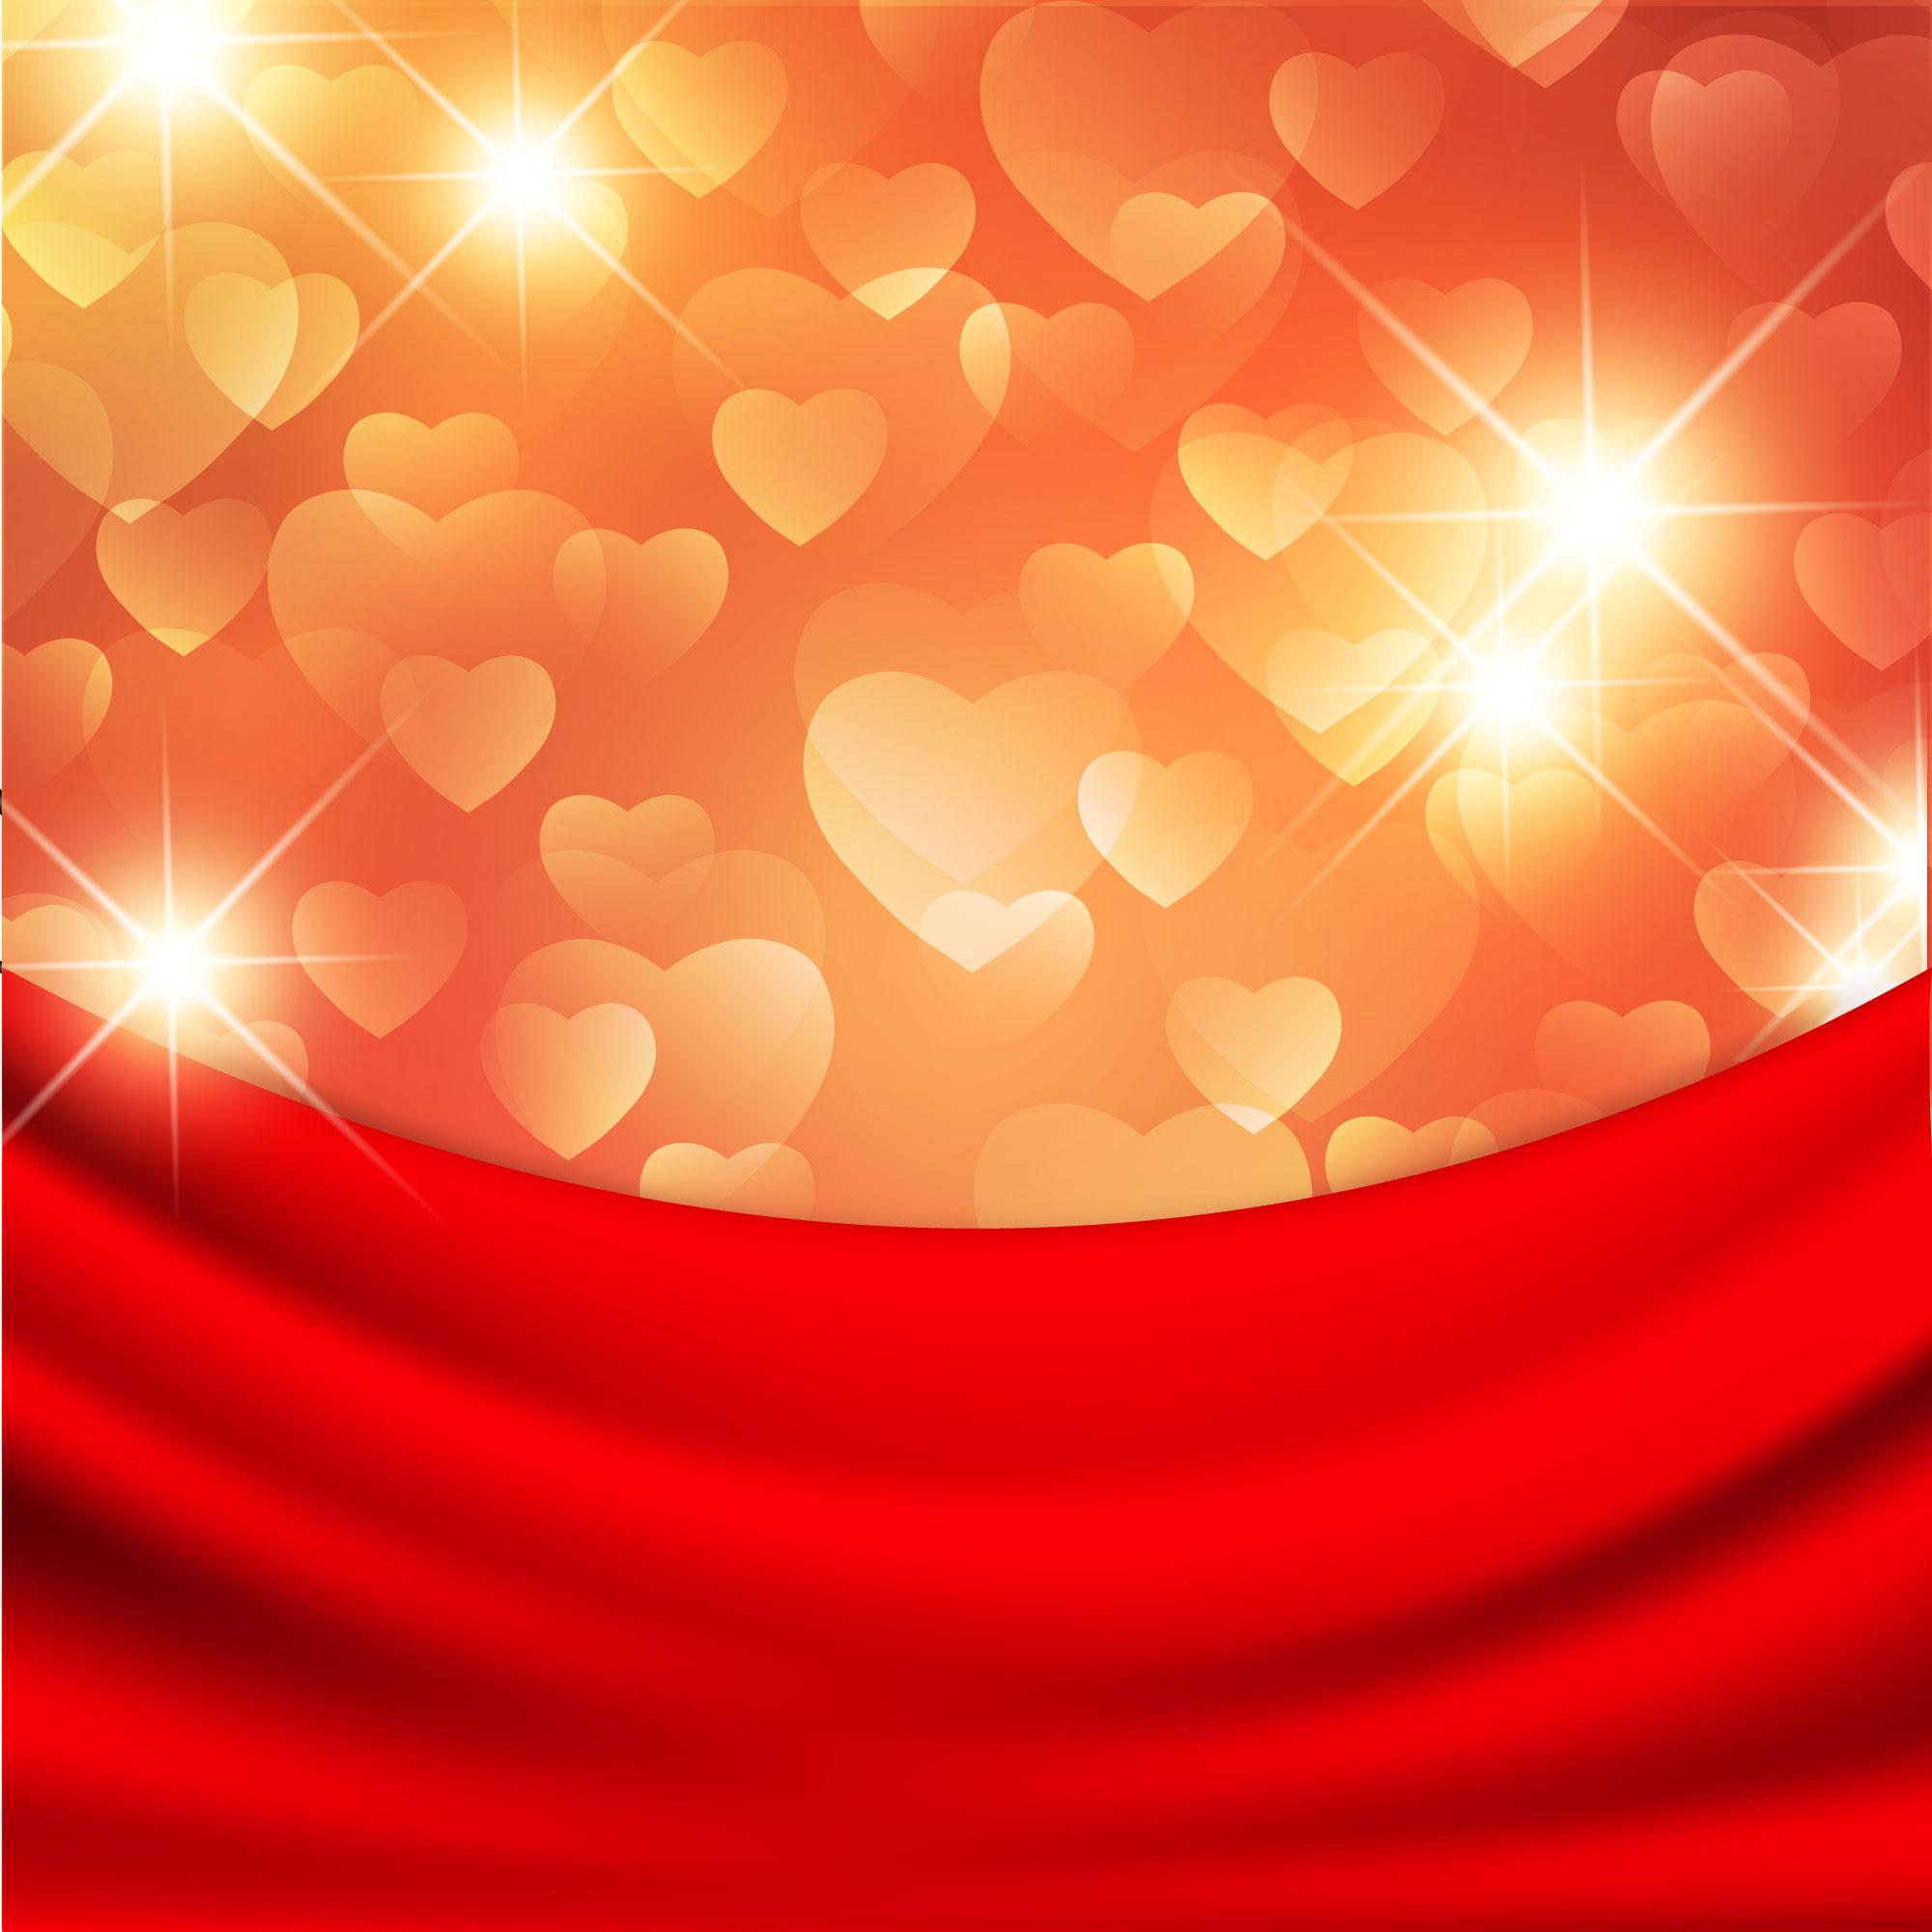 en forme de coeur de la journ u00e9e de la femme de l effet de lumi u00e8re de fond f u00eate des femmes en